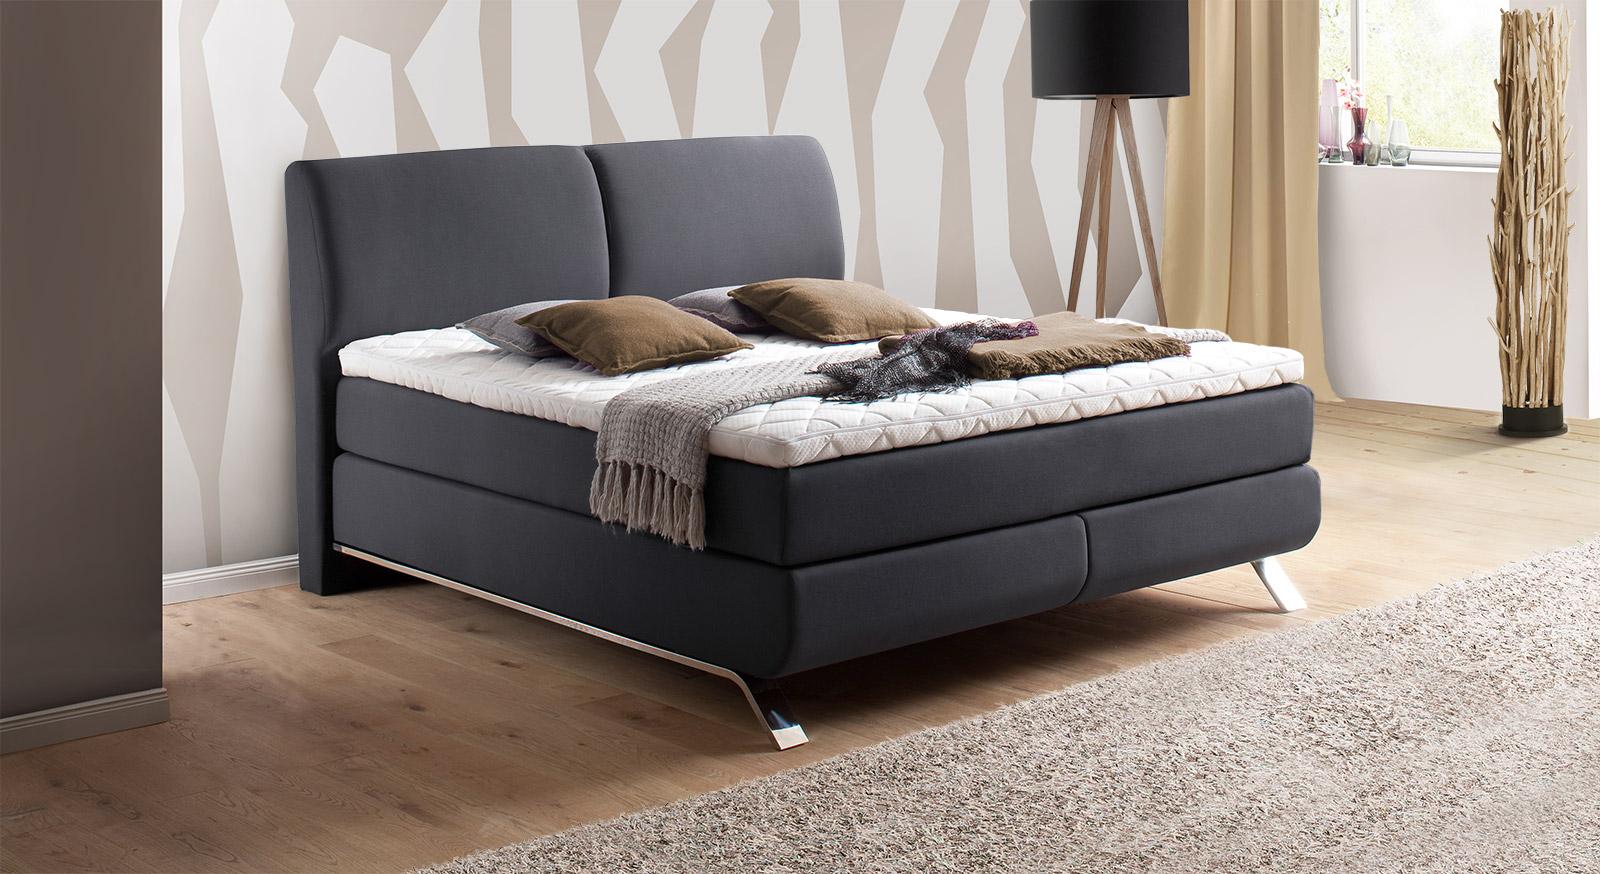 king size boxspringbett mit modernen metallkufen auburn. Black Bedroom Furniture Sets. Home Design Ideas